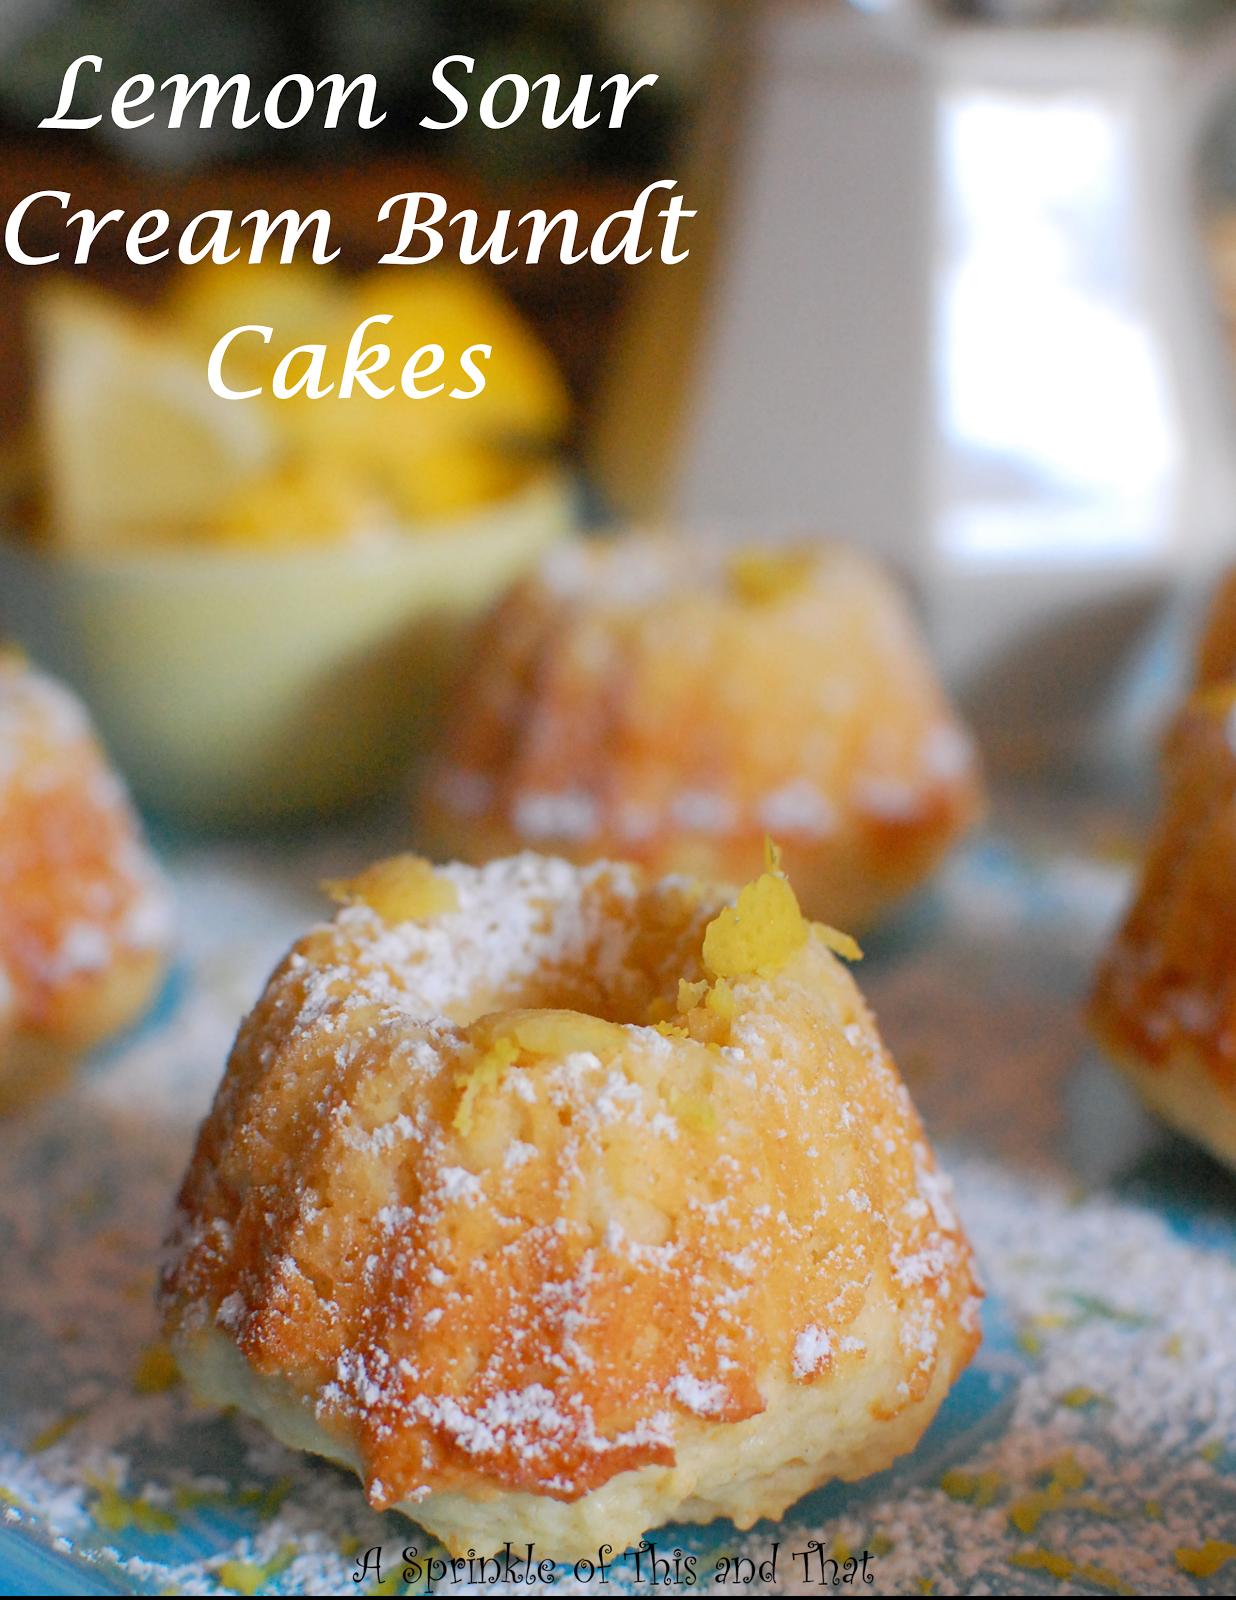 Lemon Sour Cream Bundt Cakes Lemon Recipes Lime Recipes Bundt Cake